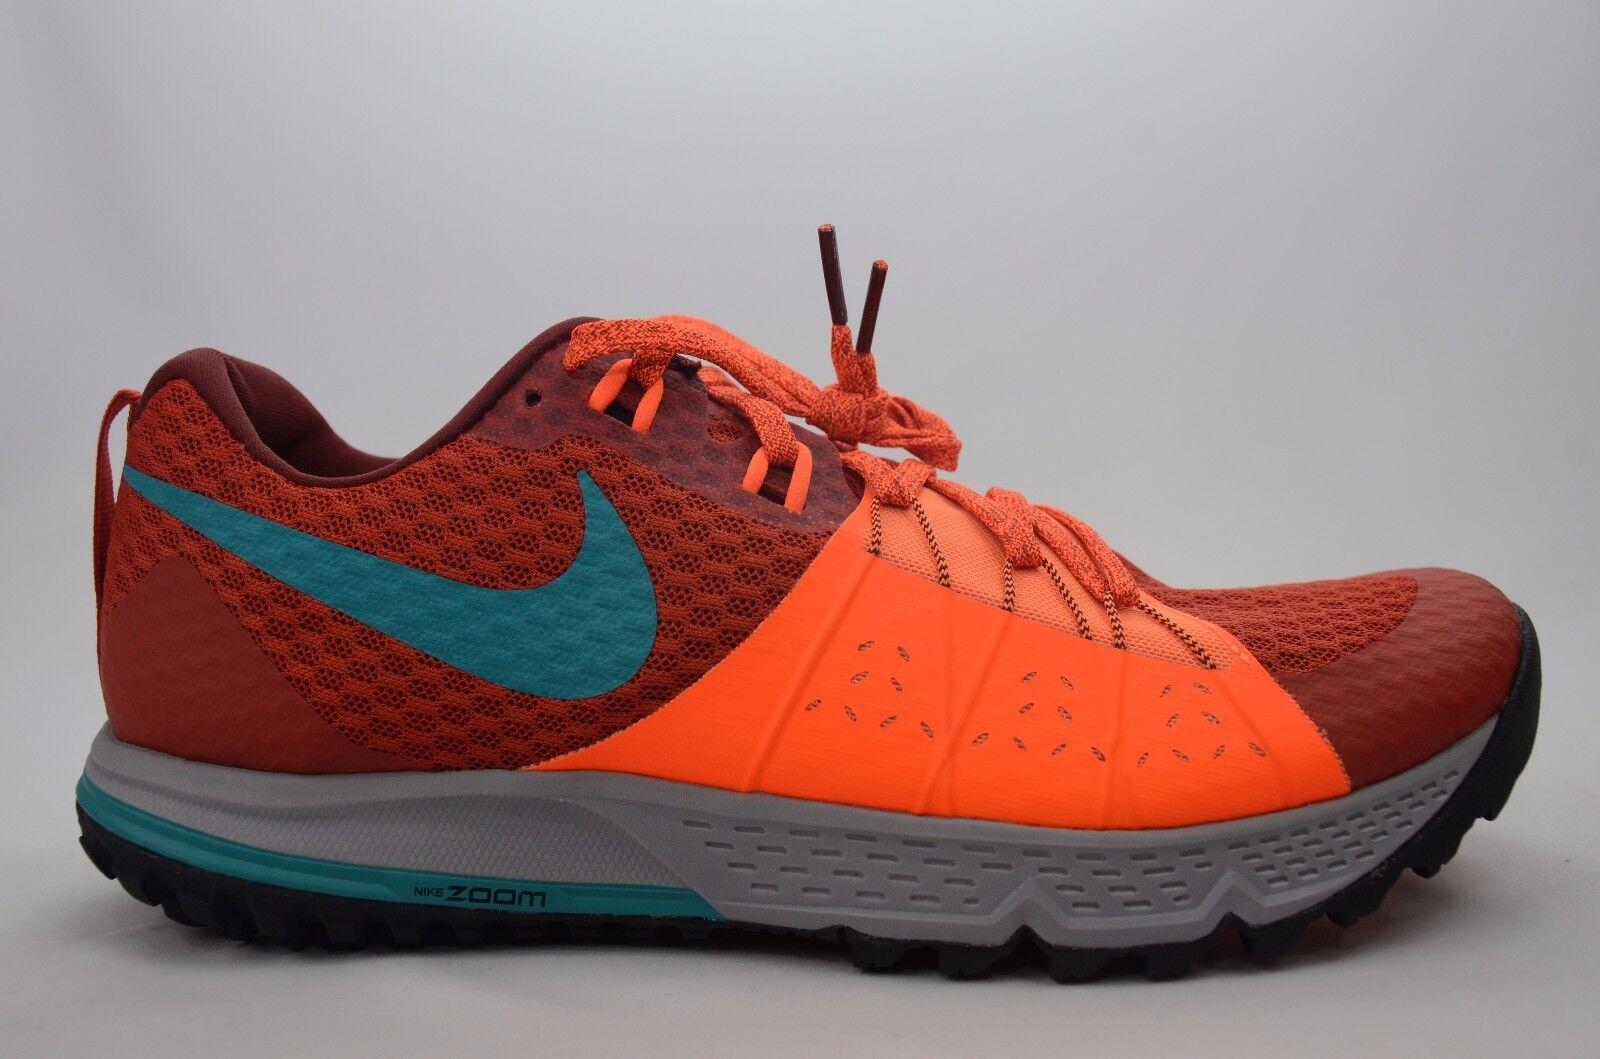 Nike Zoom Wildhorse 4 Trail Running Men's Size 10 New in Box 880565 600